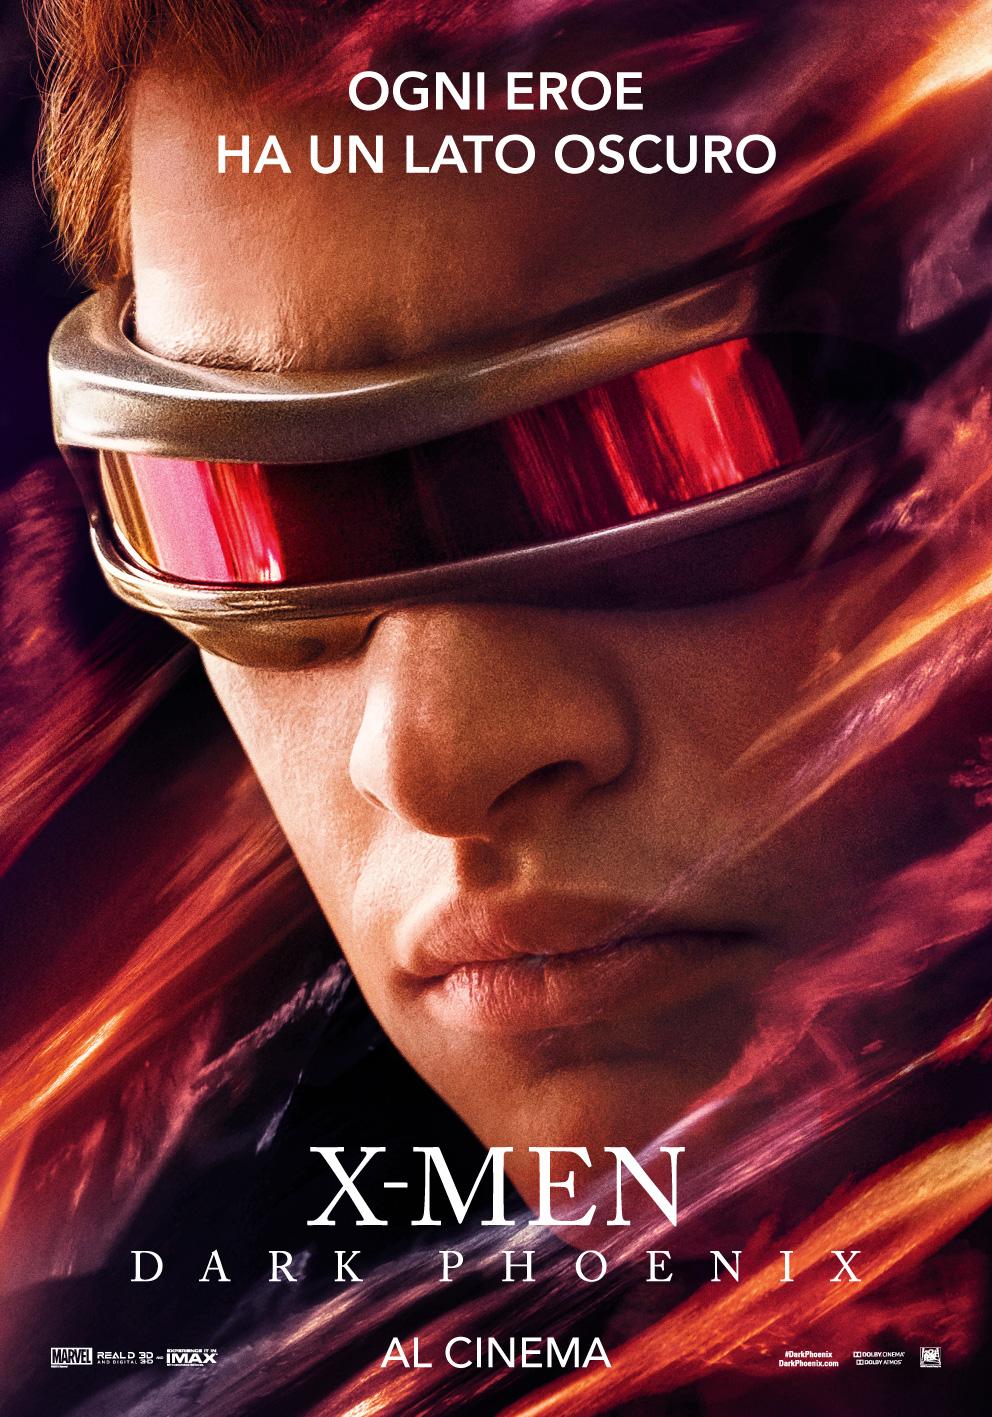 X-Men: Dark Phoenix, il character poster per Ciclope